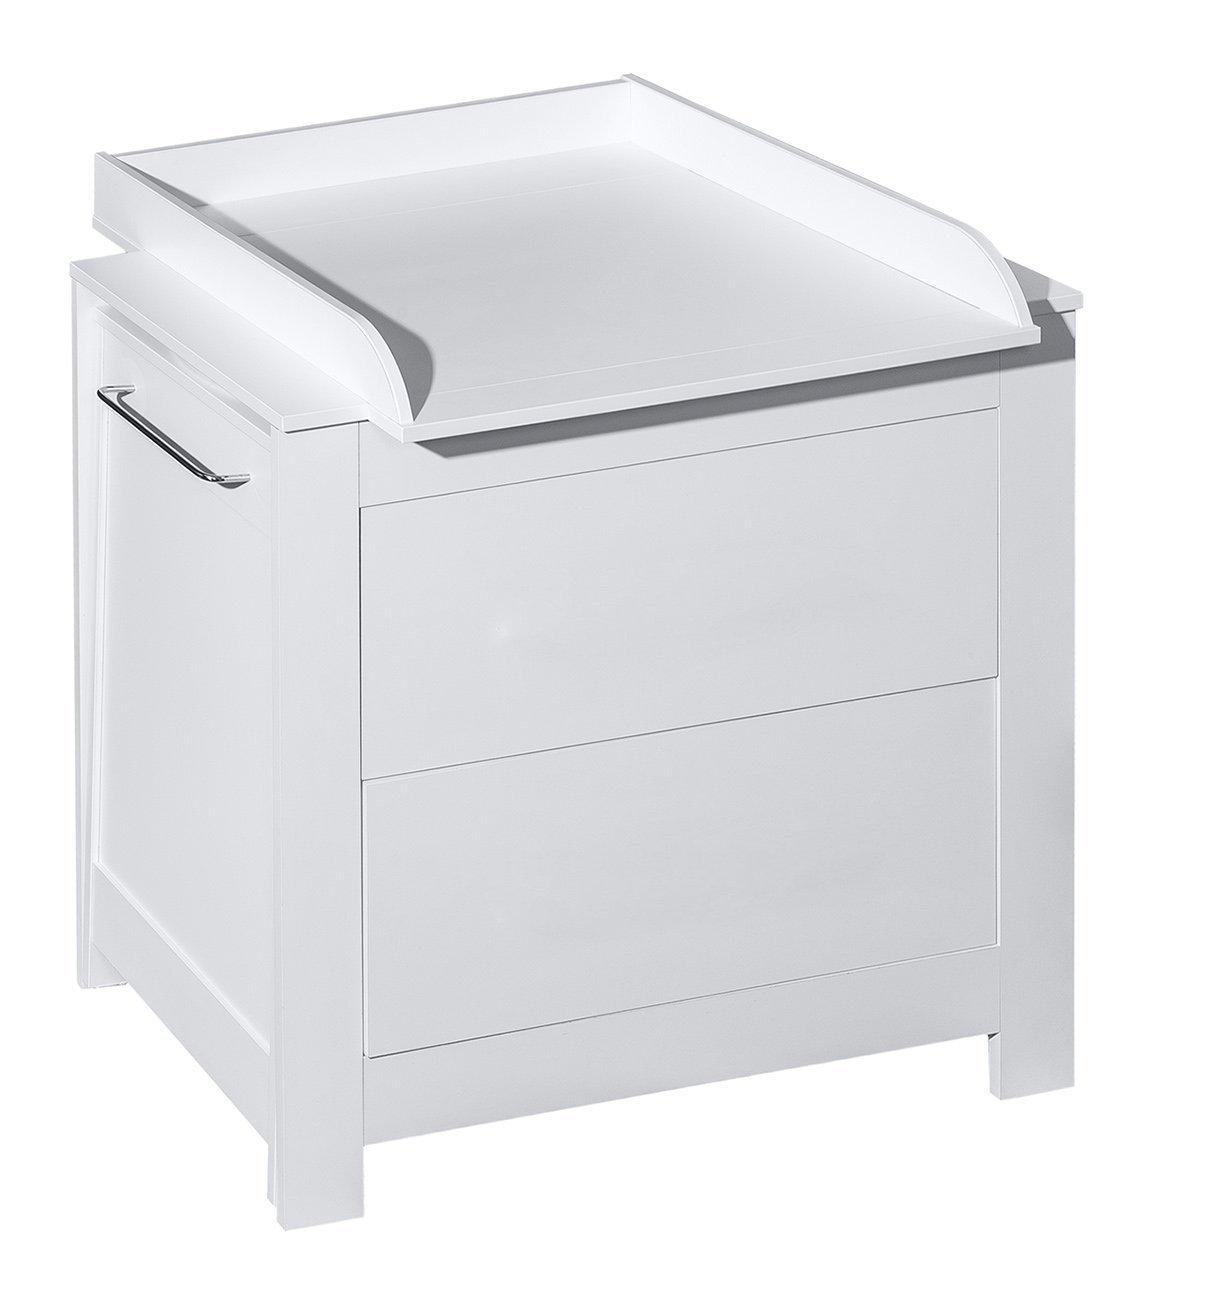 Belivin/® 3in1 Wickelkommode wei/ß gro/ße Schubladen ausziehbare Badewanne Wickeltisch wei/ß inkl umbaubar zur normalen Kommode extra gro/ßen abnembaren Wickelaufsatz besonders stabil